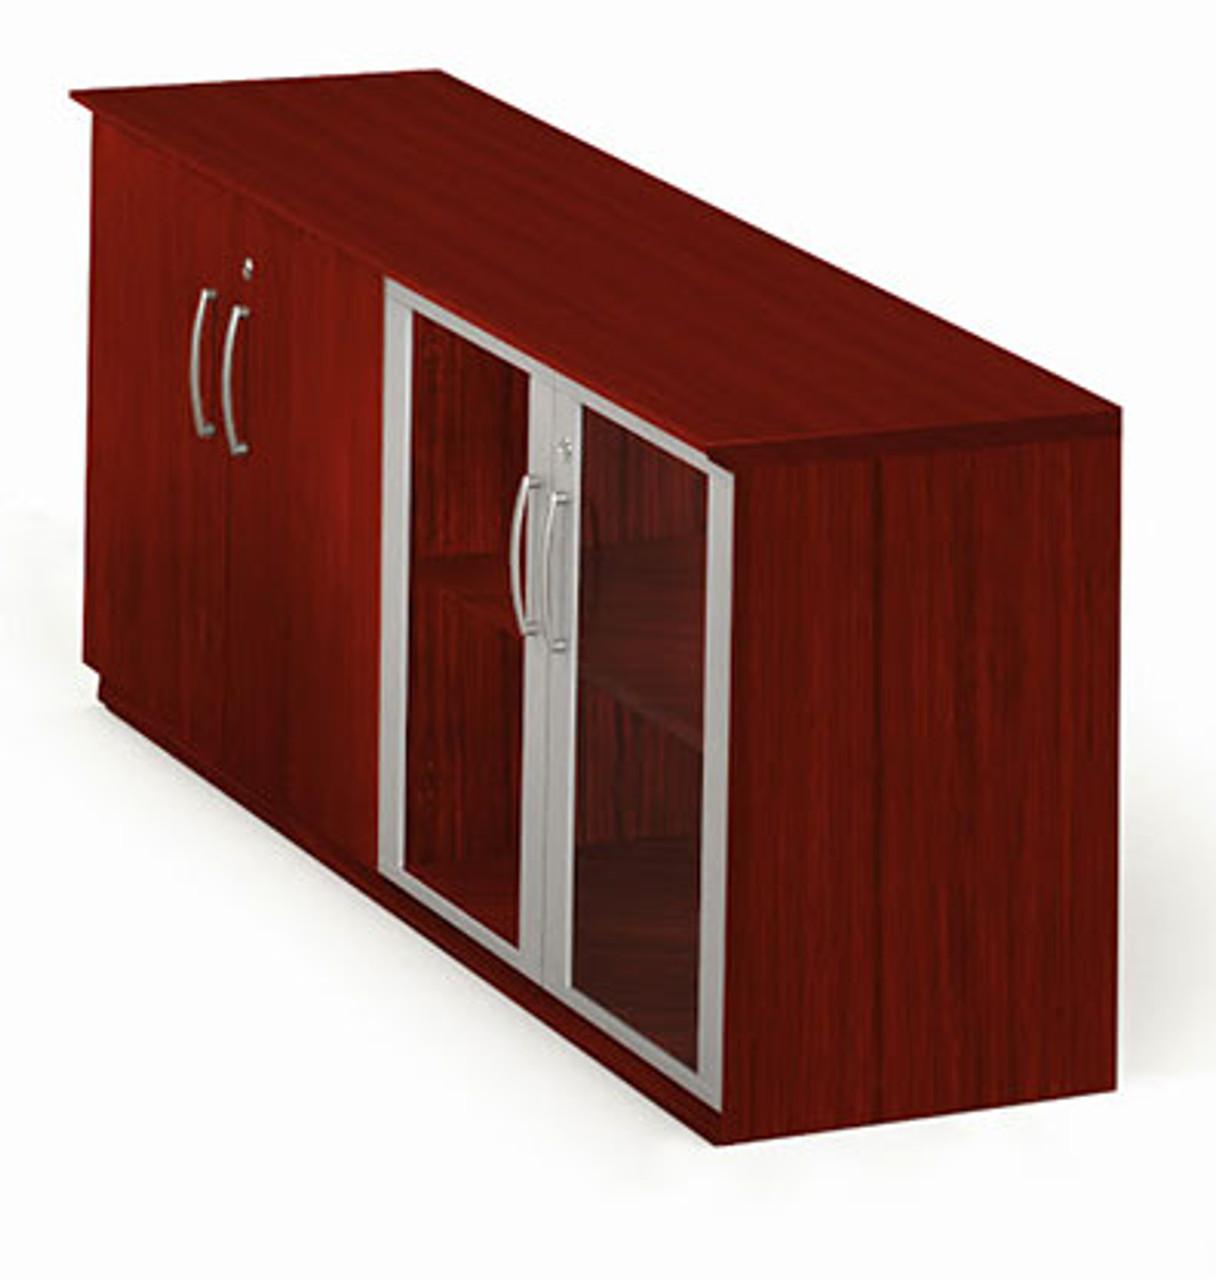 4 Doors Low Wall Cabnet, #MT-MED-CAB7